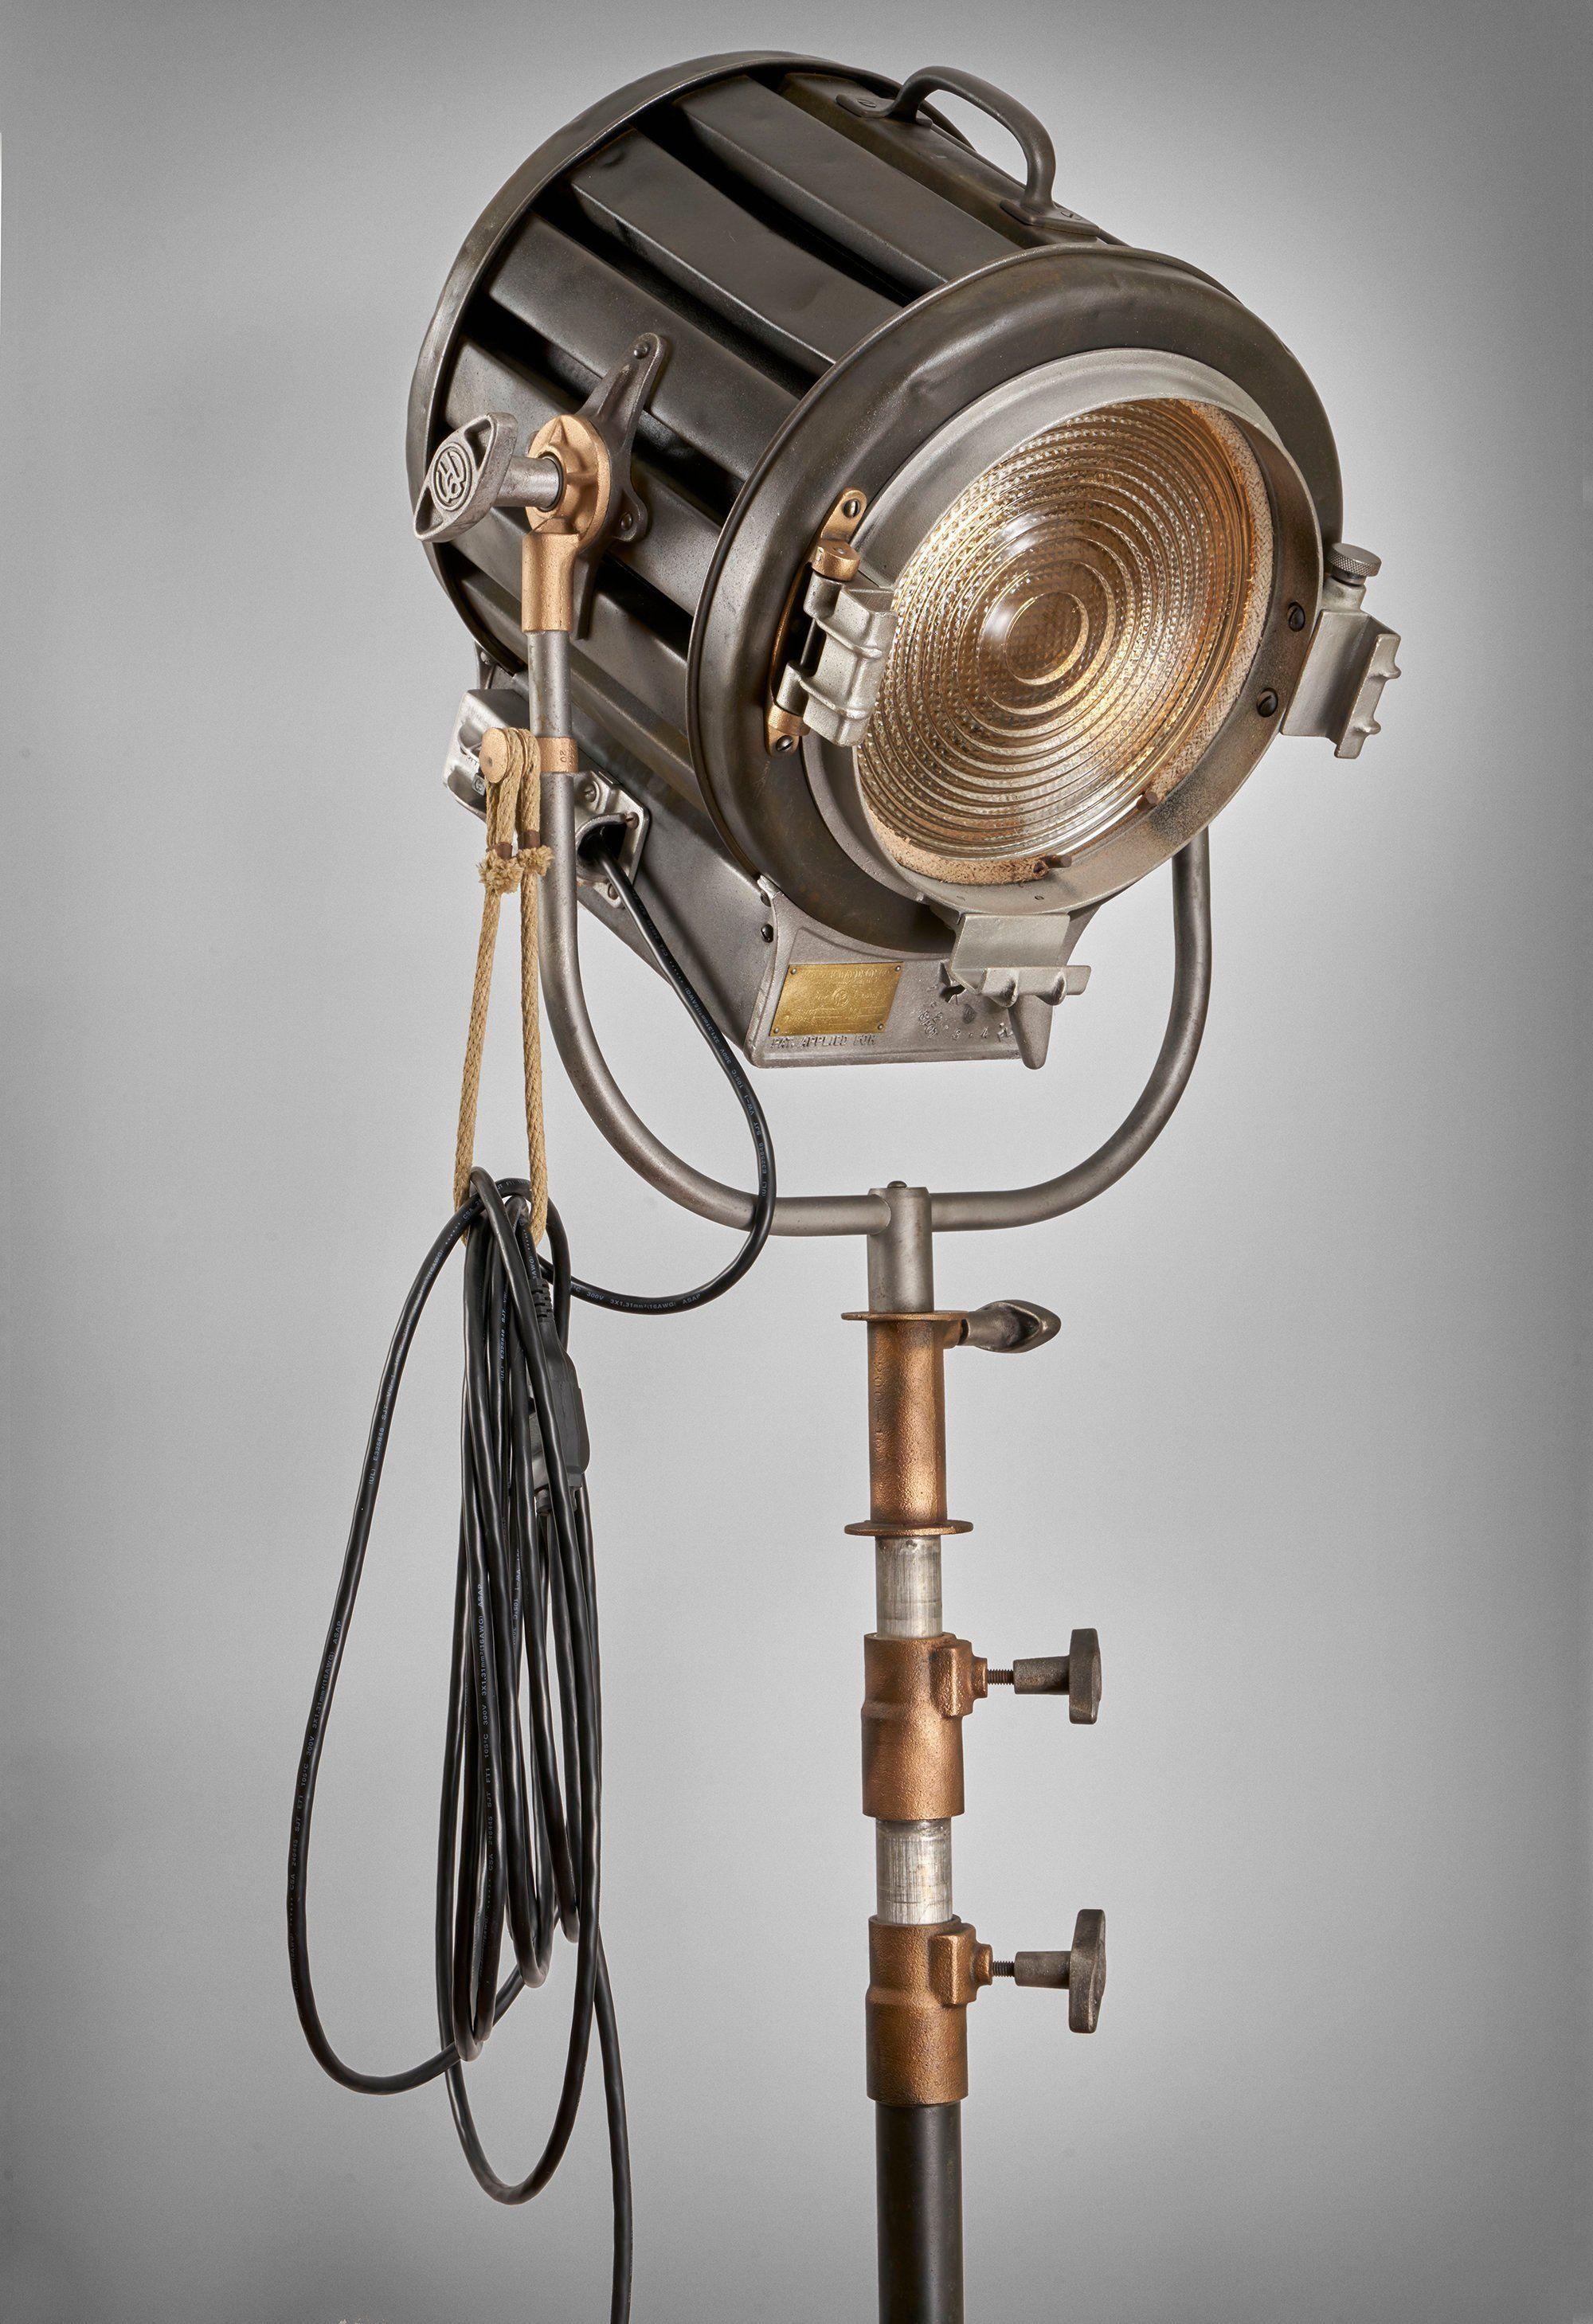 1940 S 410 2k Mole Richardson Vintage Hollywood Movie Etsy Vintage Industrial Lighting Diy Industrial Lighting Industrial Light Fixtures